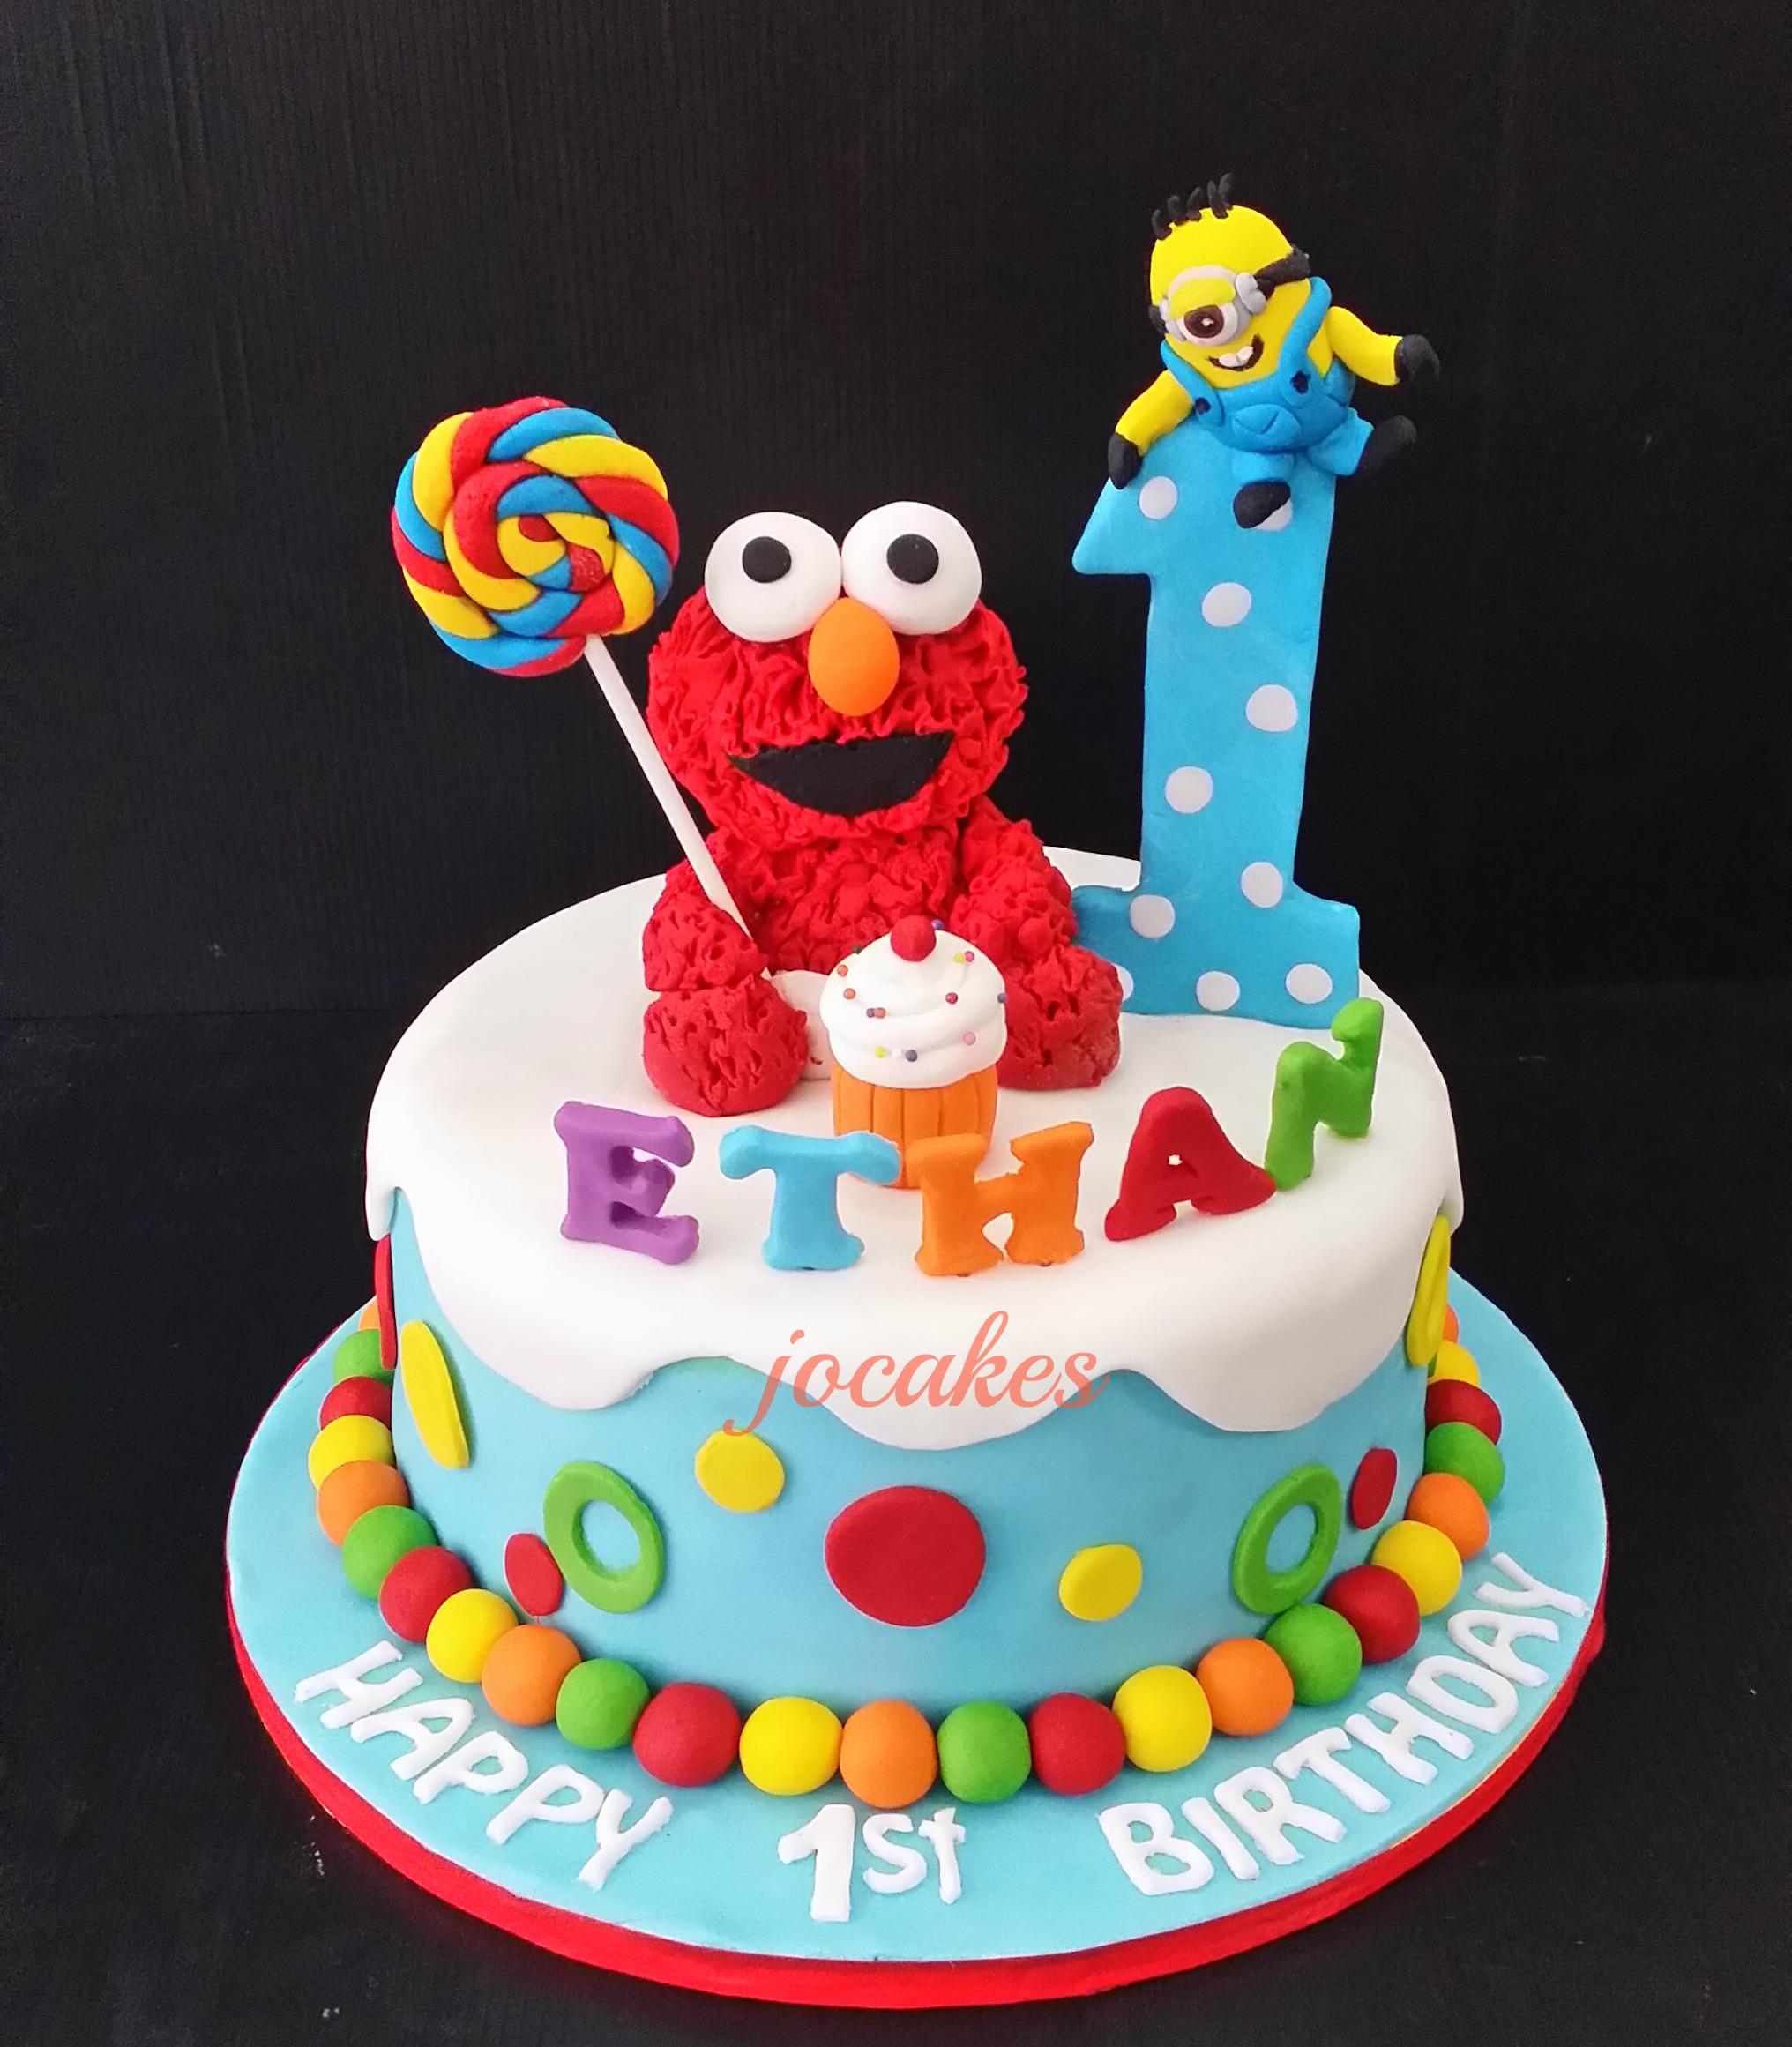 Enjoyable 10 Emo Birthday Cakes That Say Happy Birthday Chris Photo Happy Funny Birthday Cards Online Inifodamsfinfo